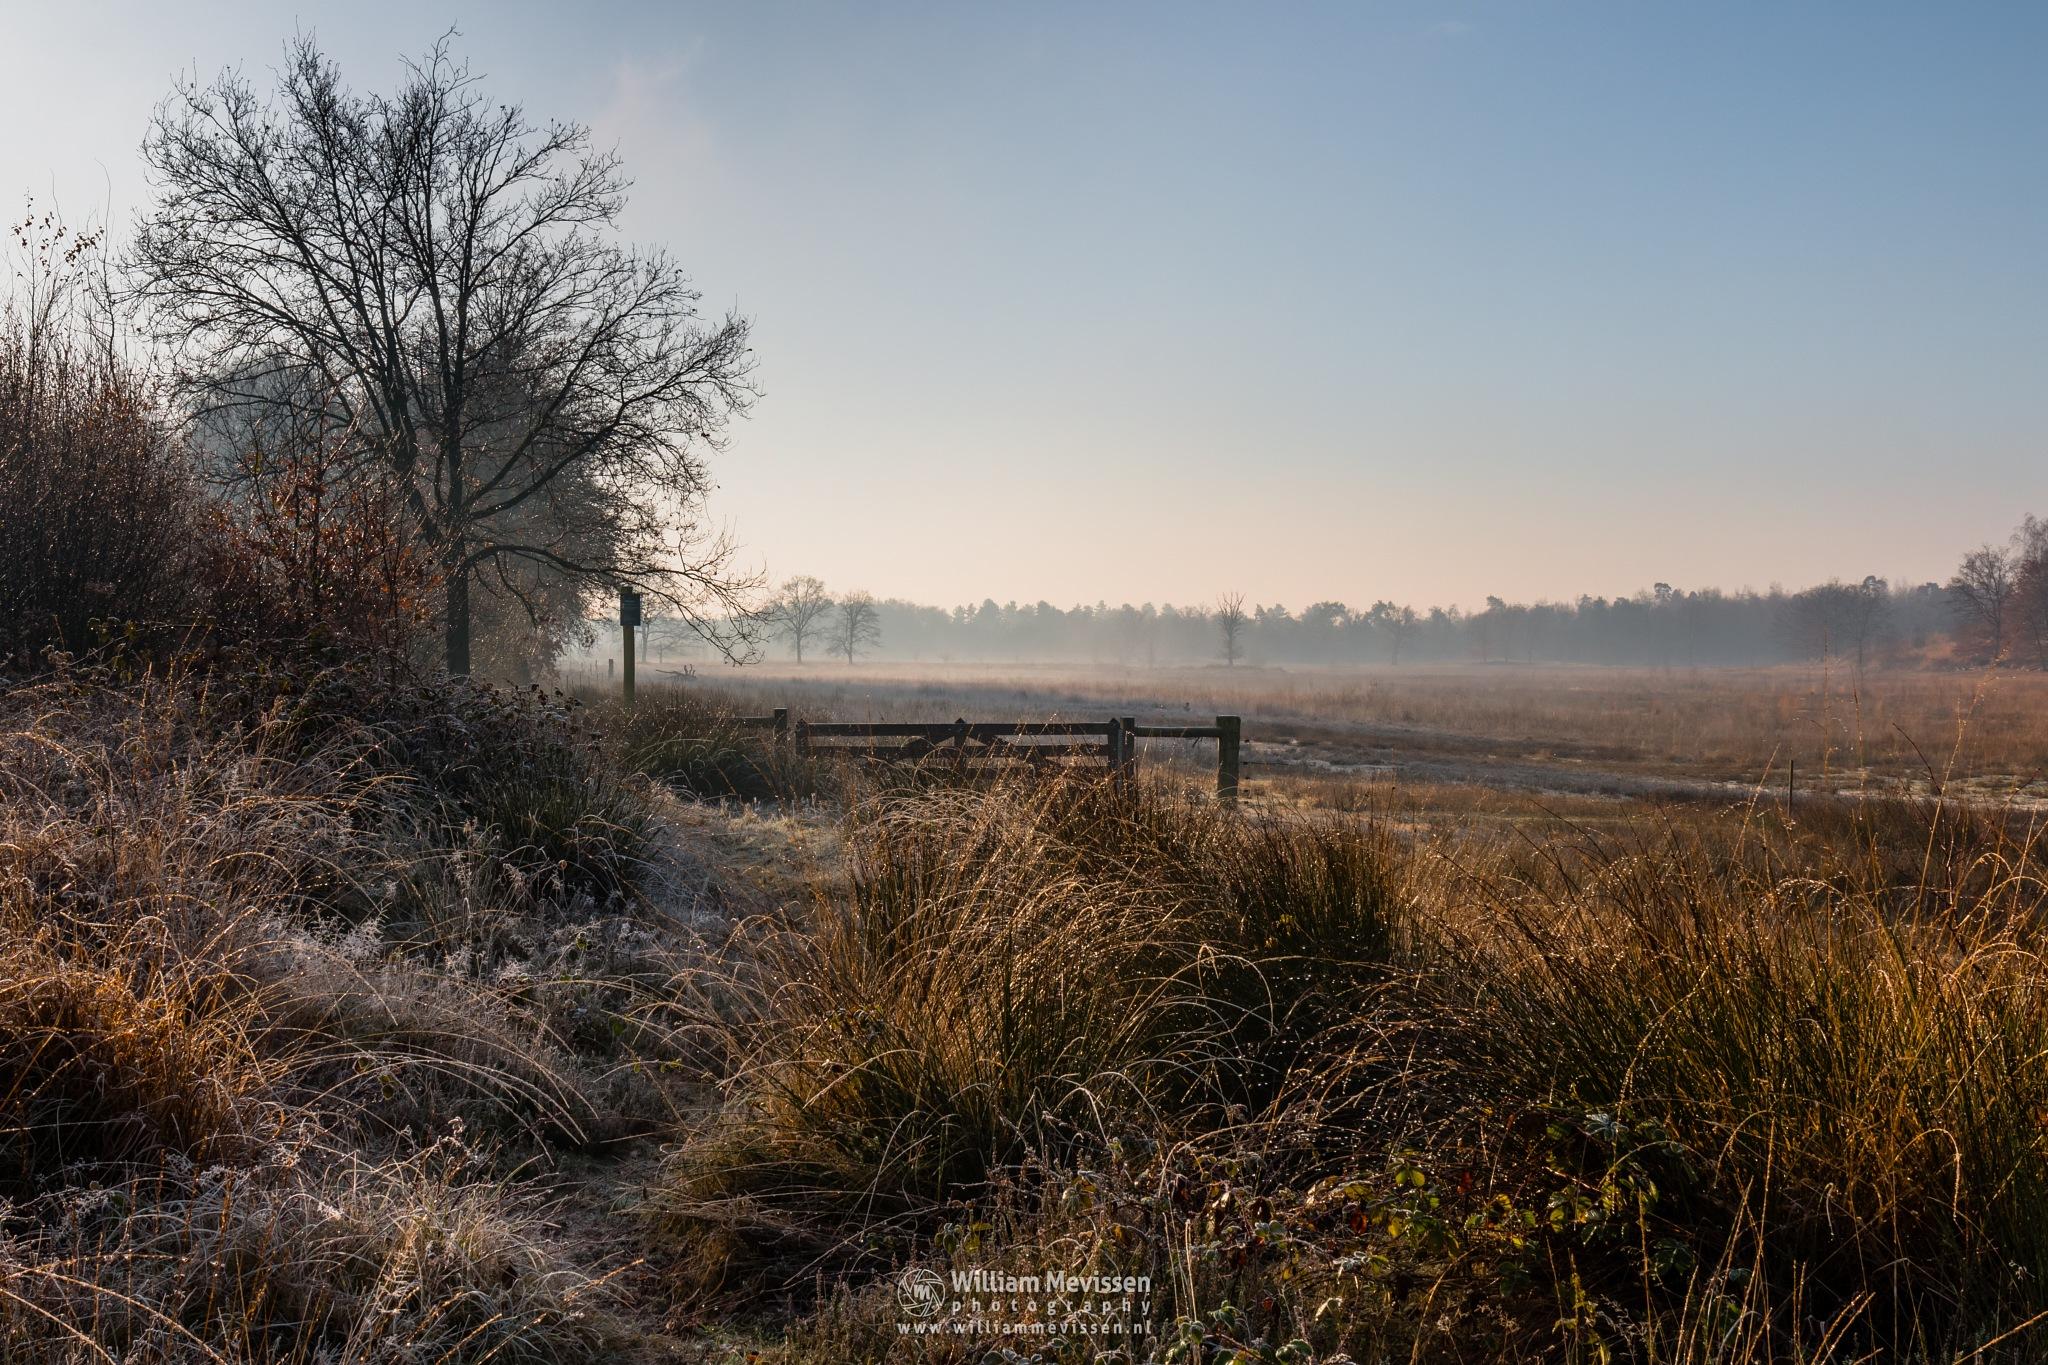 Gate Into The Mist by William Mevissen